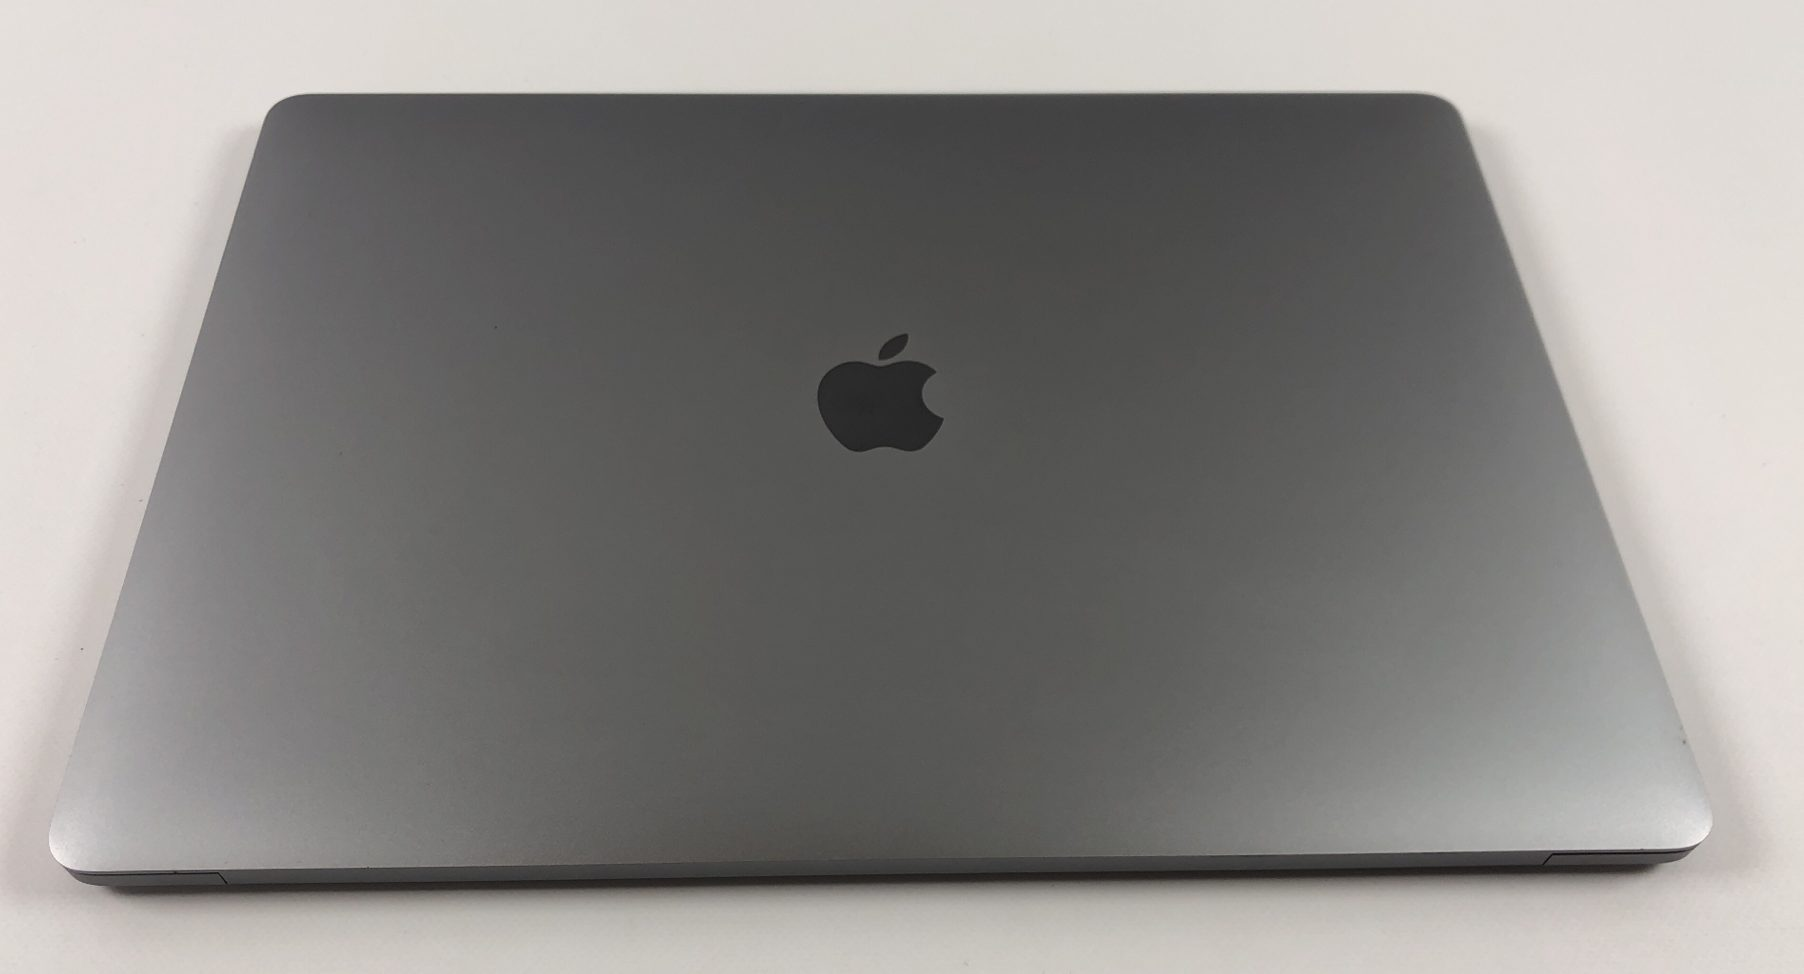 "MacBook Pro 15"" Touch Bar Late 2016 (Intel Quad-Core i7 2.9 GHz 16 GB RAM 2 TB SSD), Space Gray, Intel Quad-Core i7 2.9 GHz, 16 GB RAM, 2 TB SSD, Afbeelding 3"